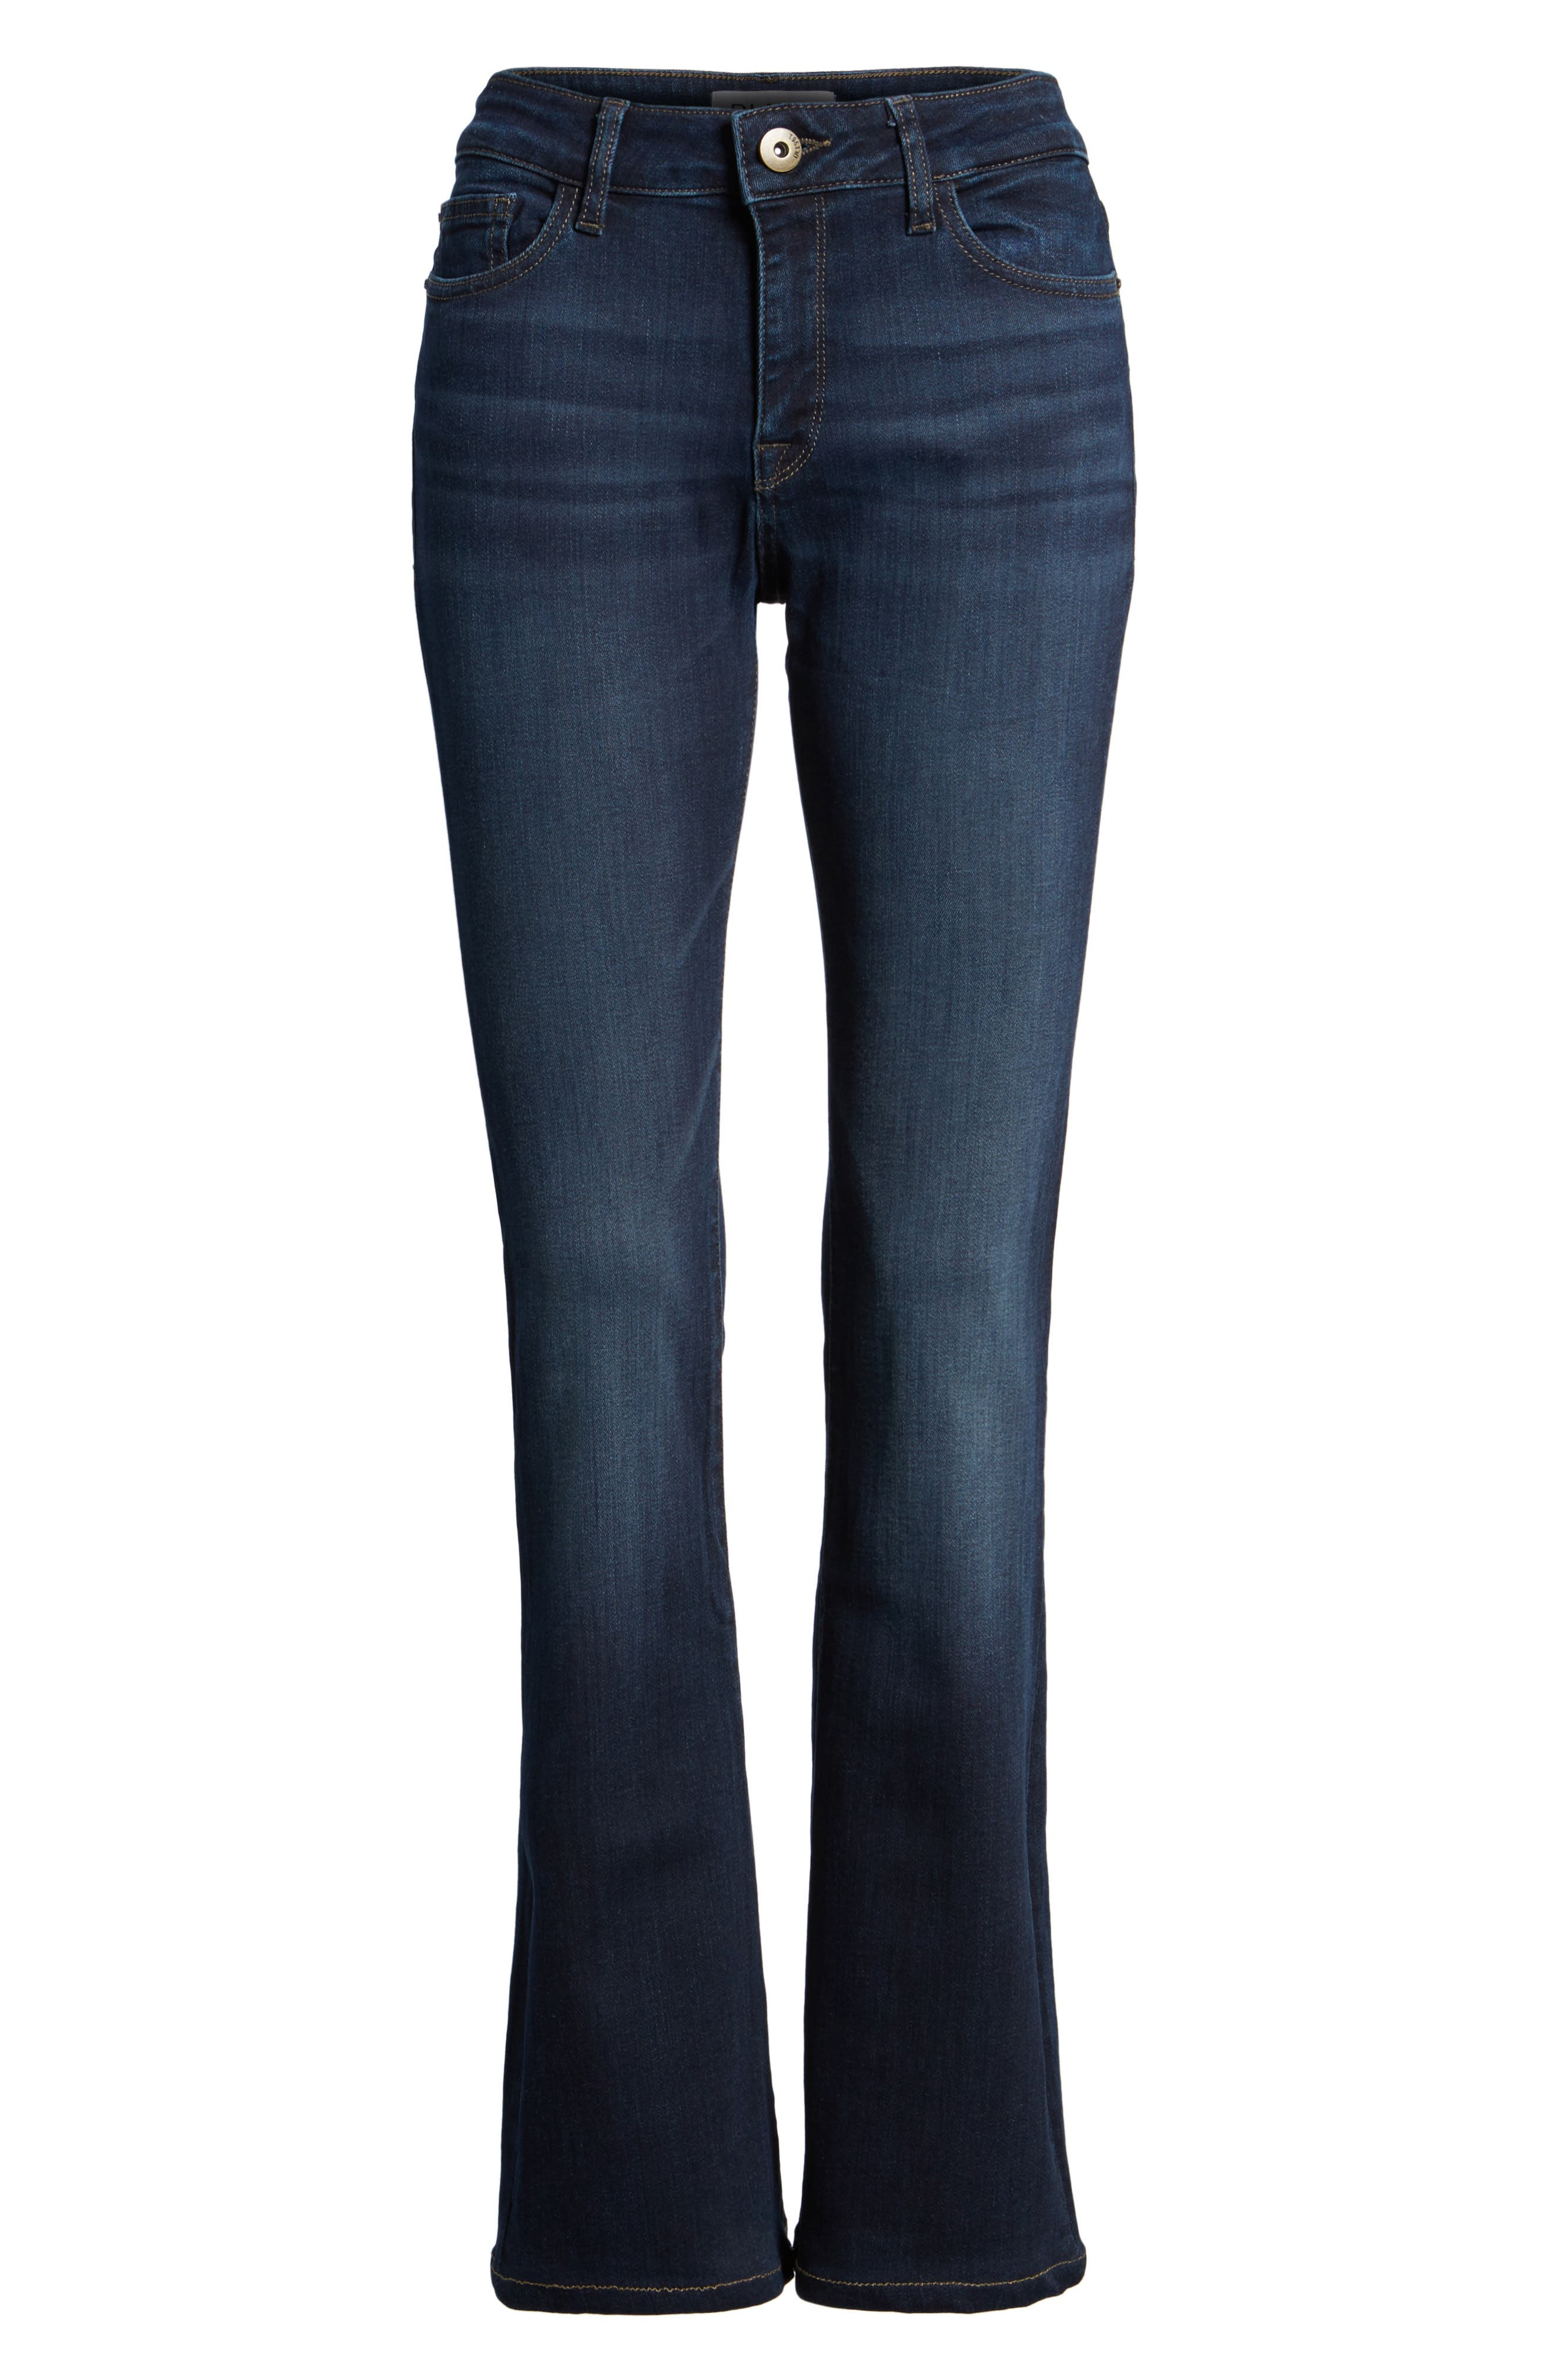 Women's Dl1961 'Bridget 33' Bootcut Jeans